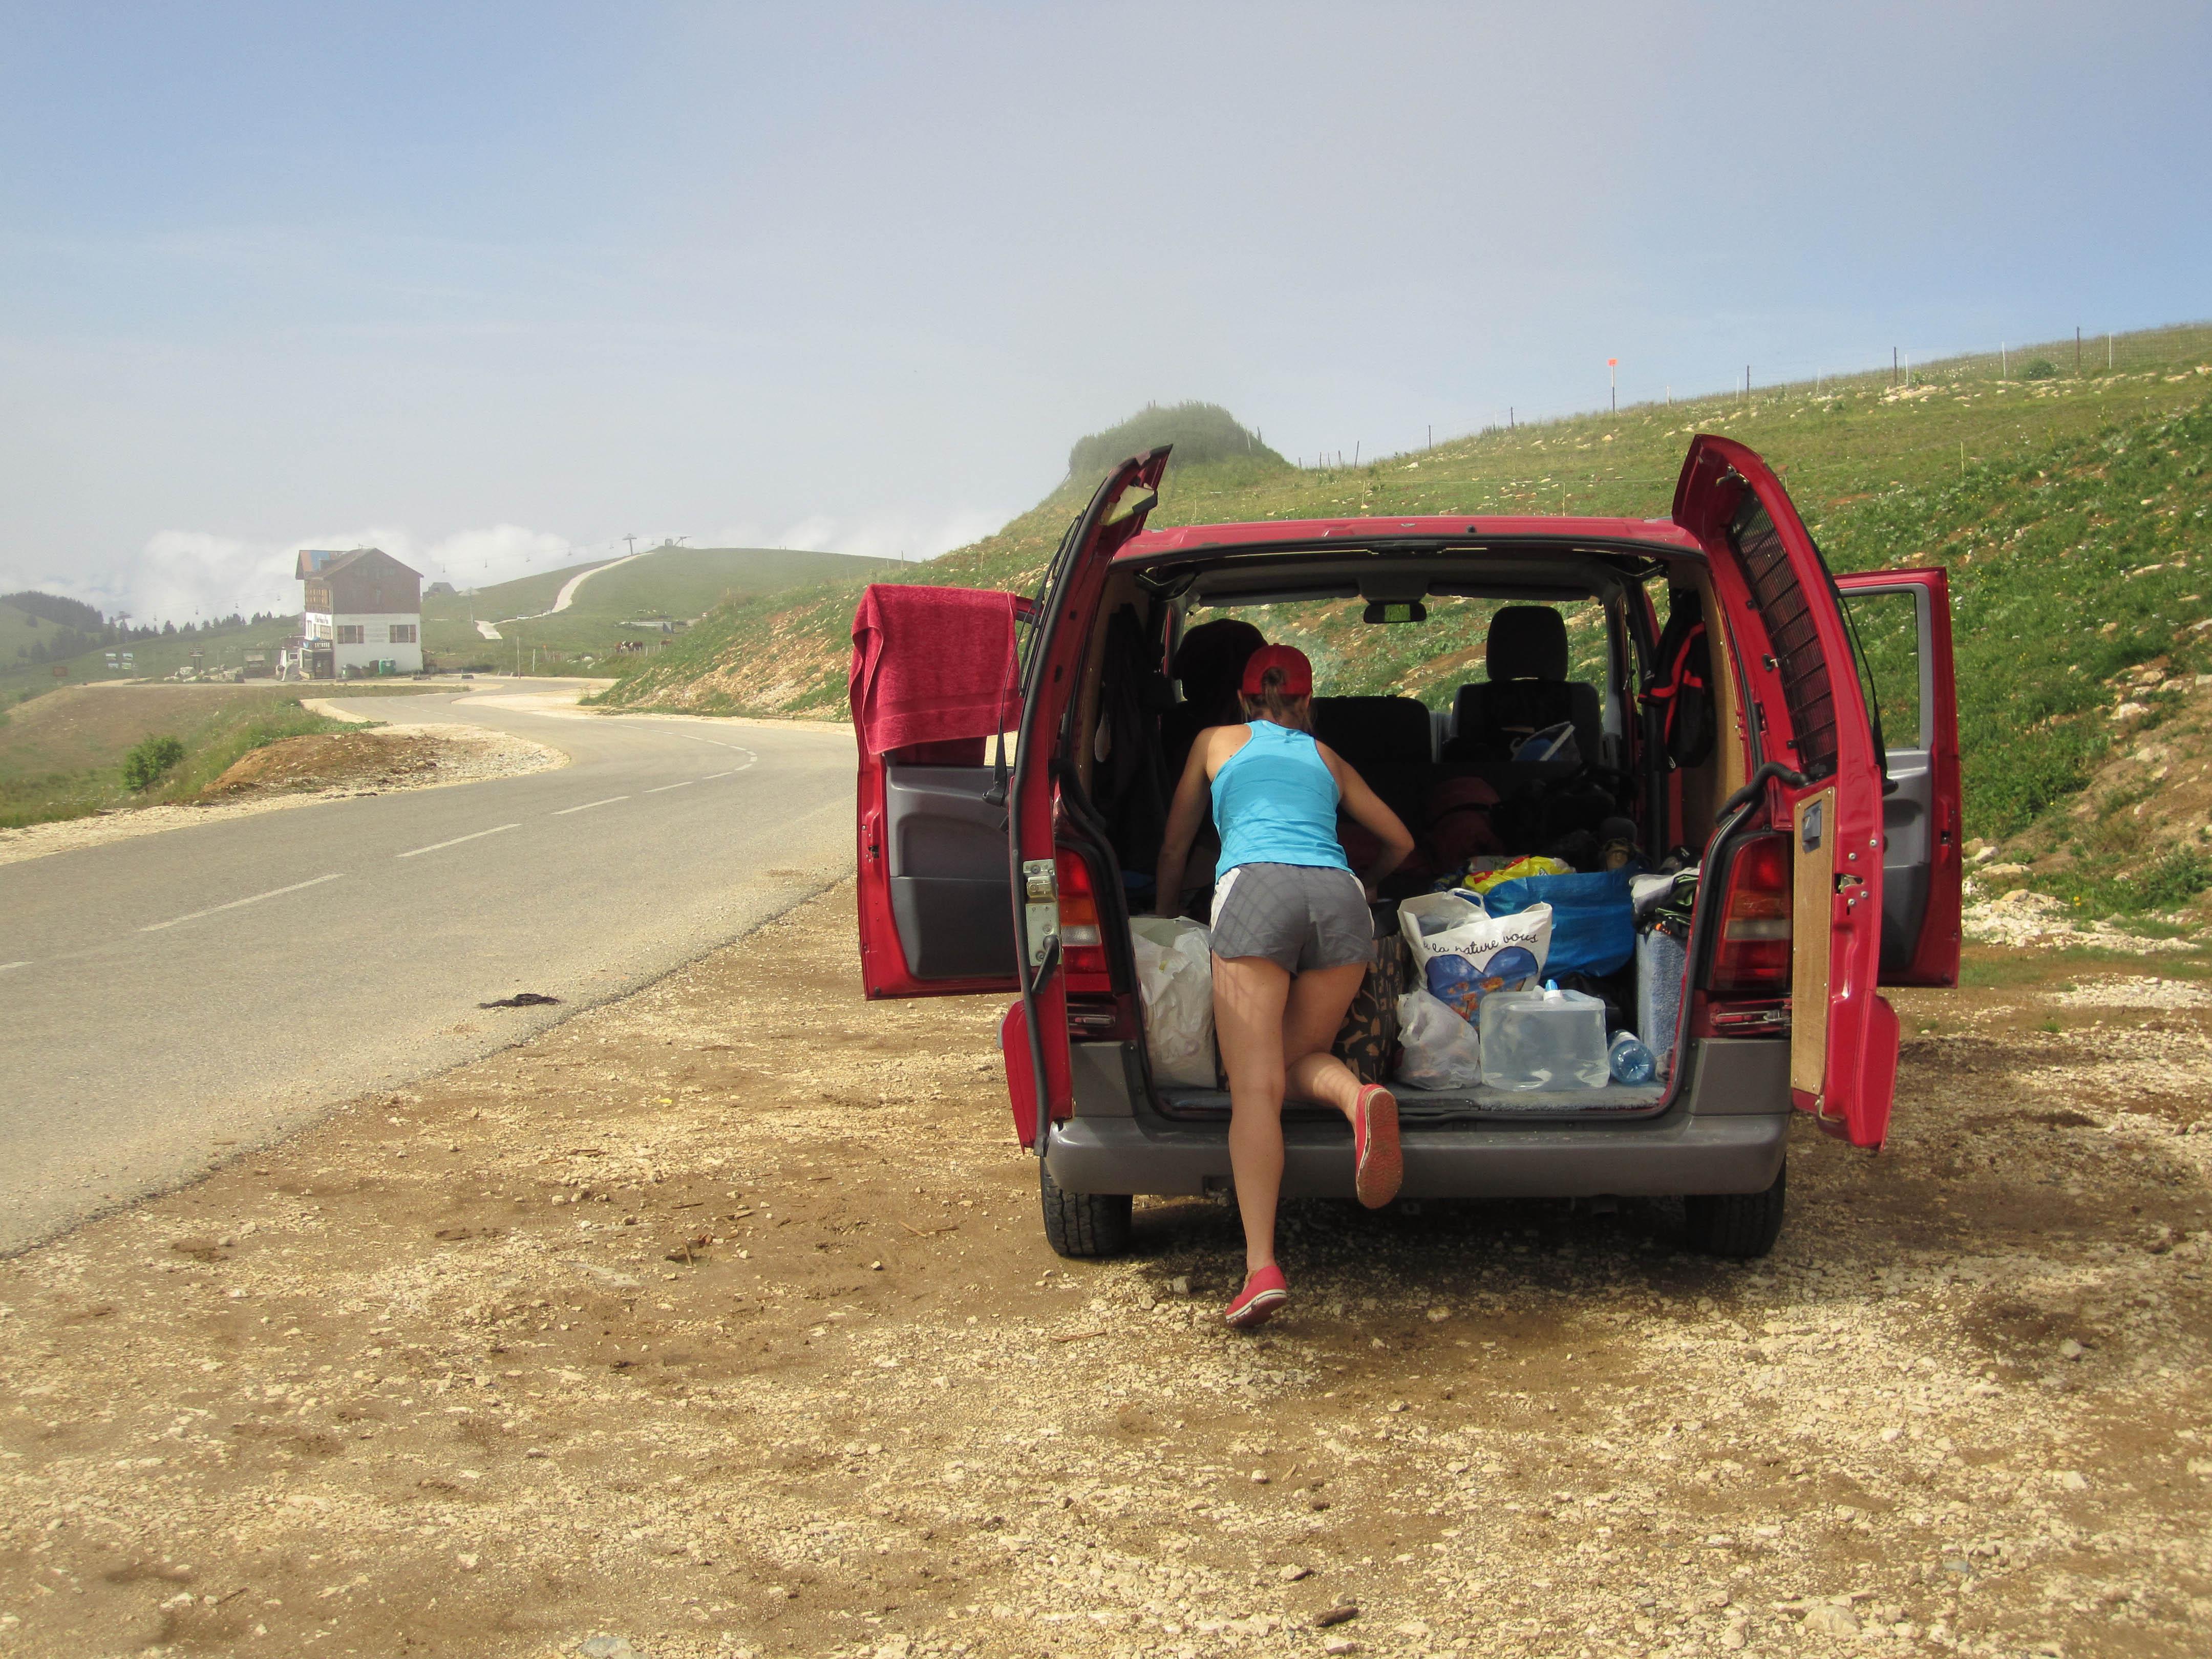 High altitude camp spot.